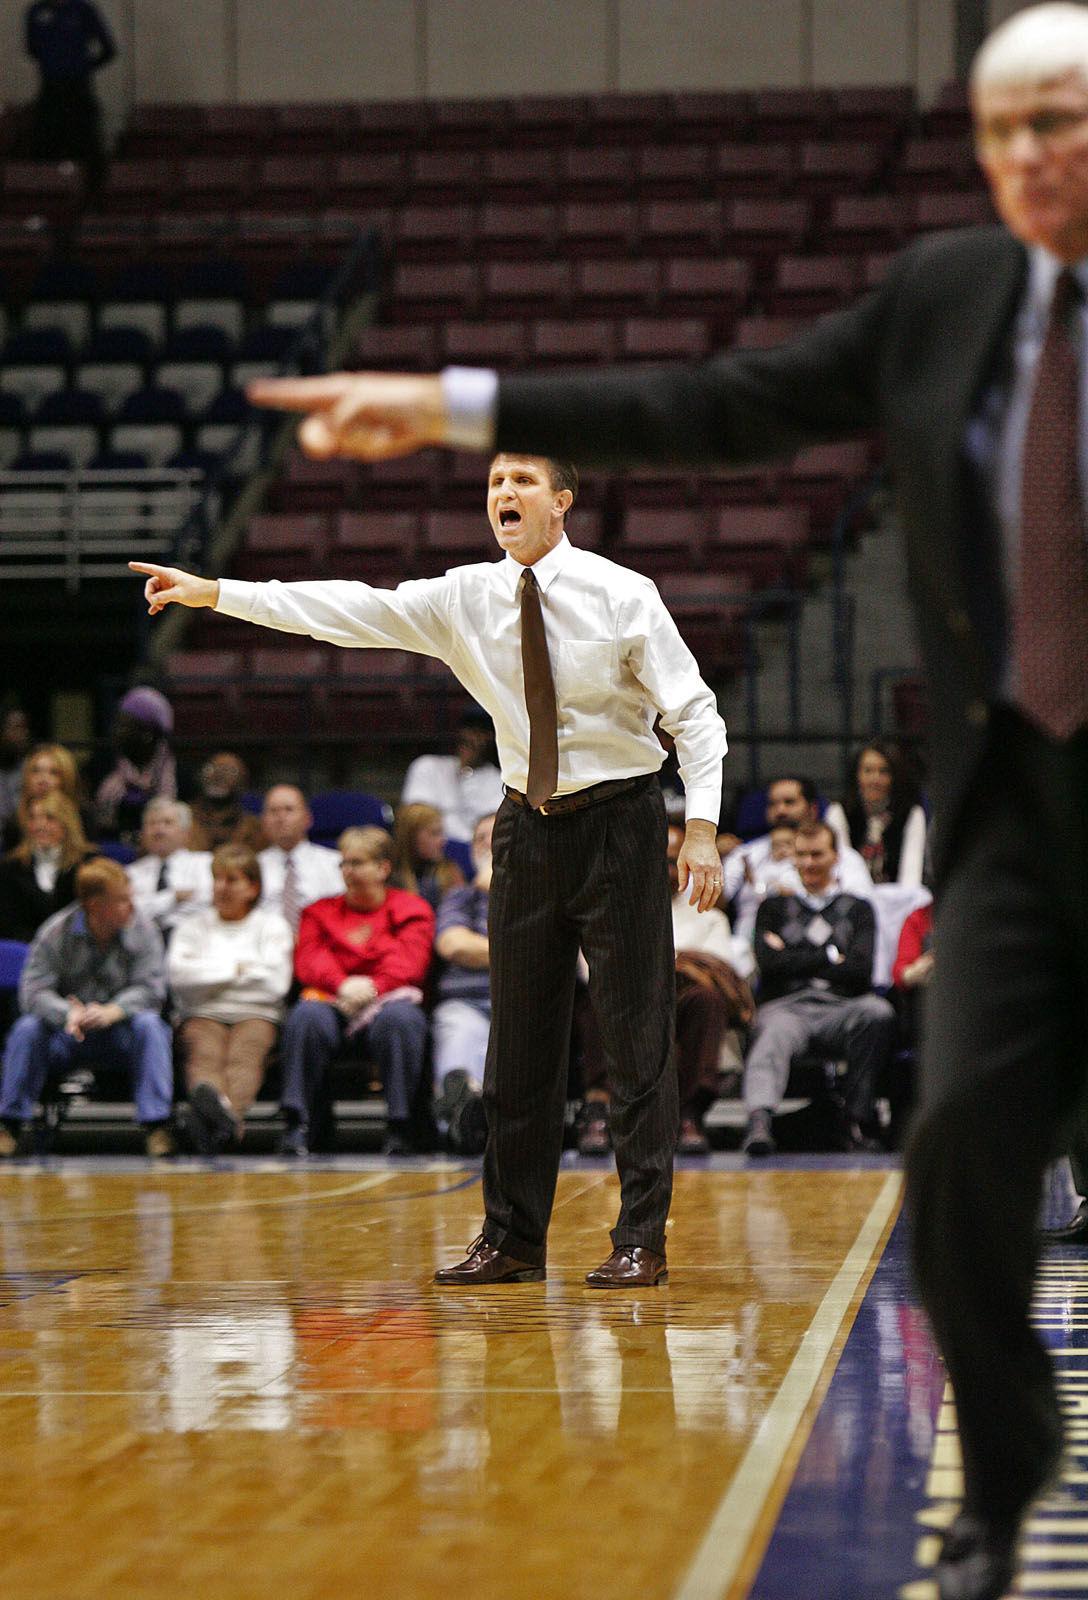 College of Charleston vs. CSU basketball